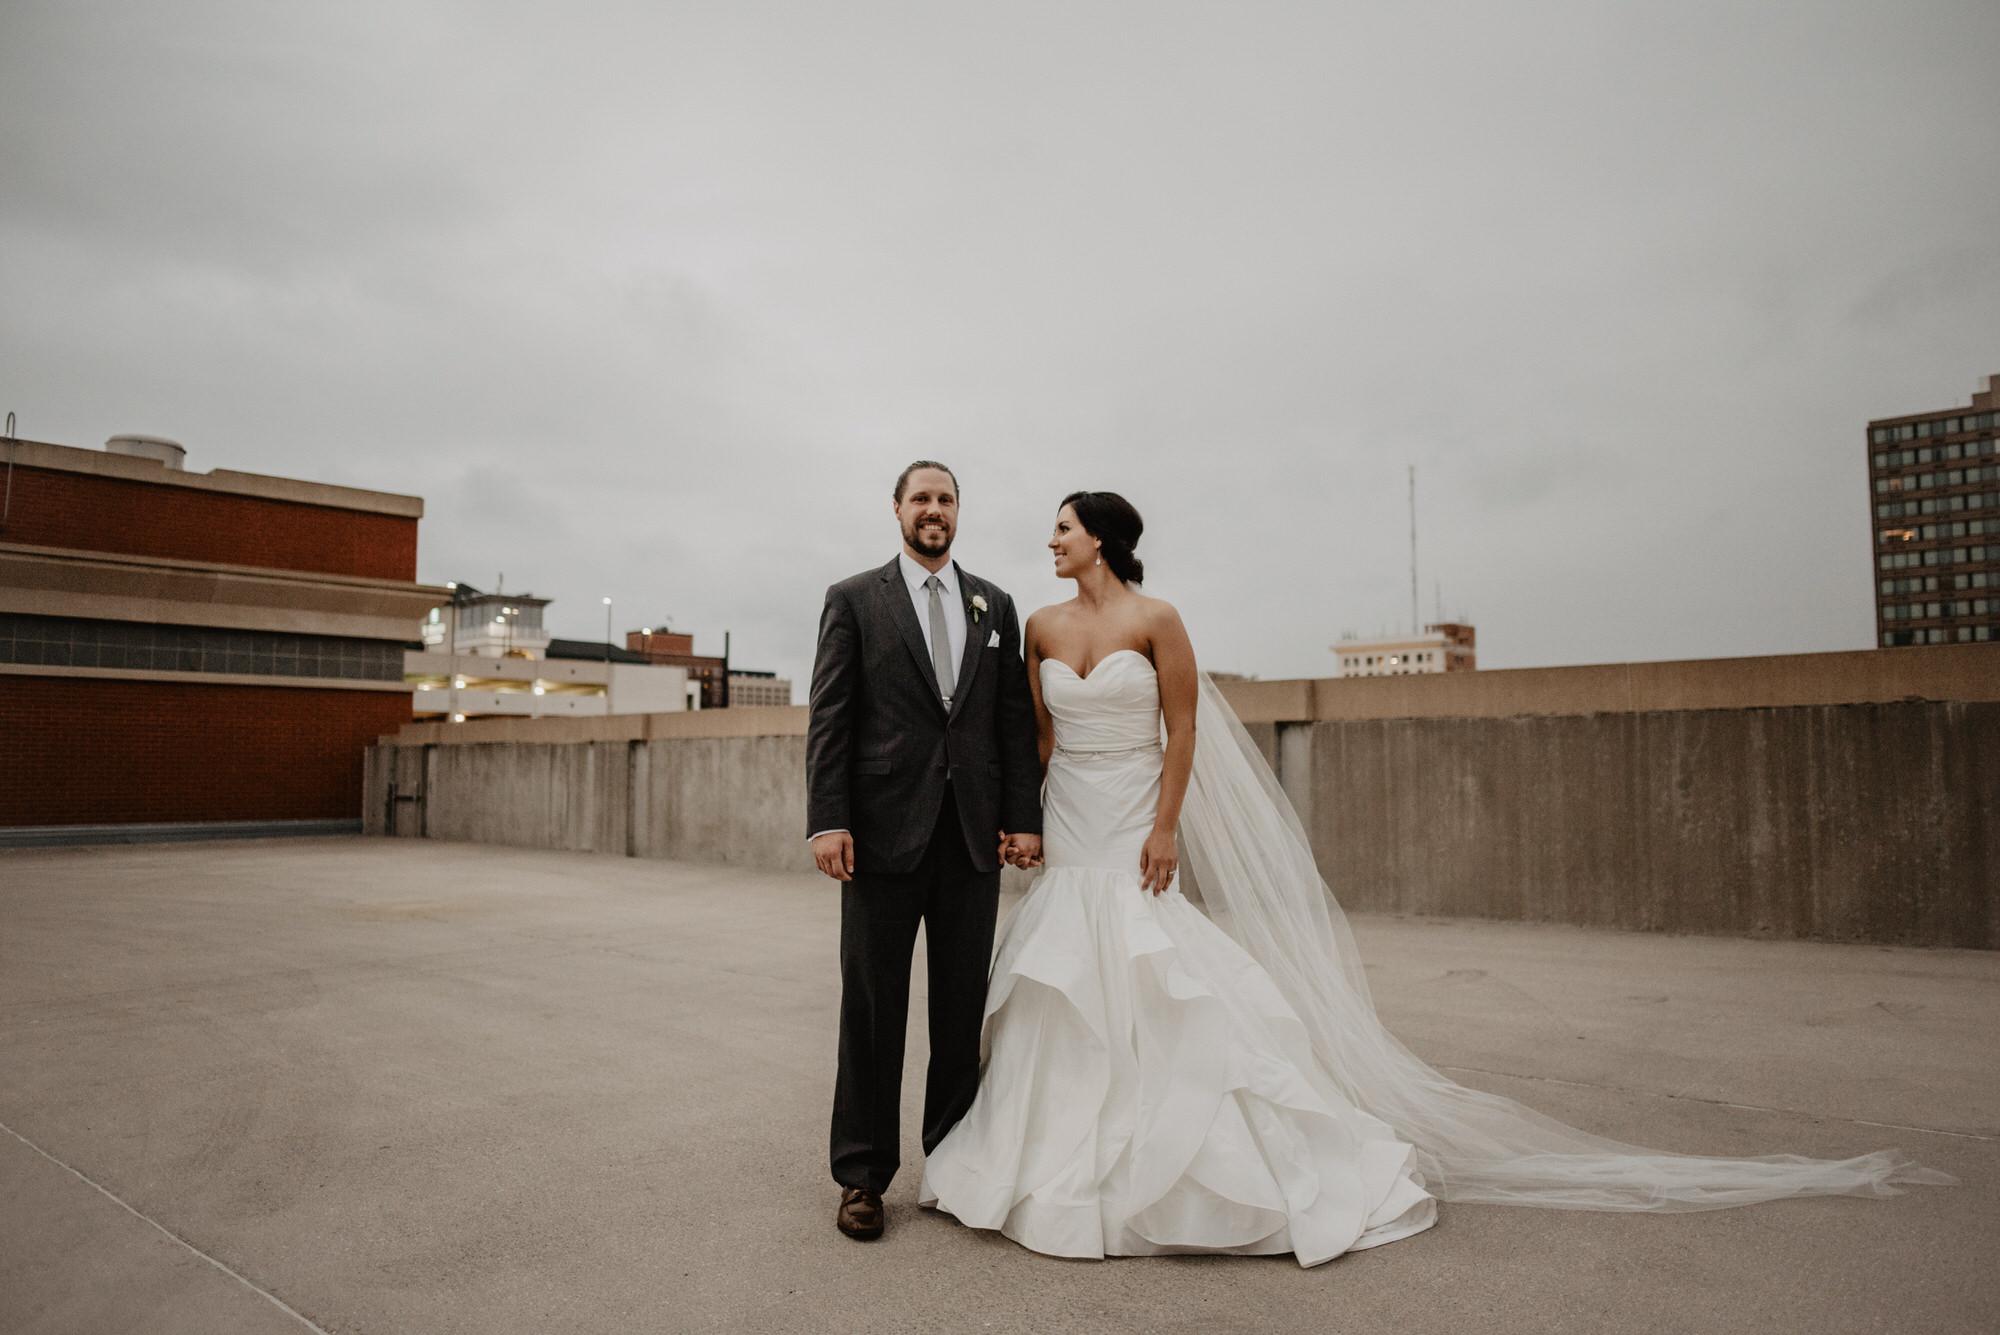 Kaylie_Sirek_Photography_Grand_Island_Kearney_Hastings_Lincoln_Nebraska_Wedding_Engagement_Grandma_Grandparent_Delray_Downtown_DowntownLincoln_LNK_Emotional_Bride_Groom_Photographer_65.jpg